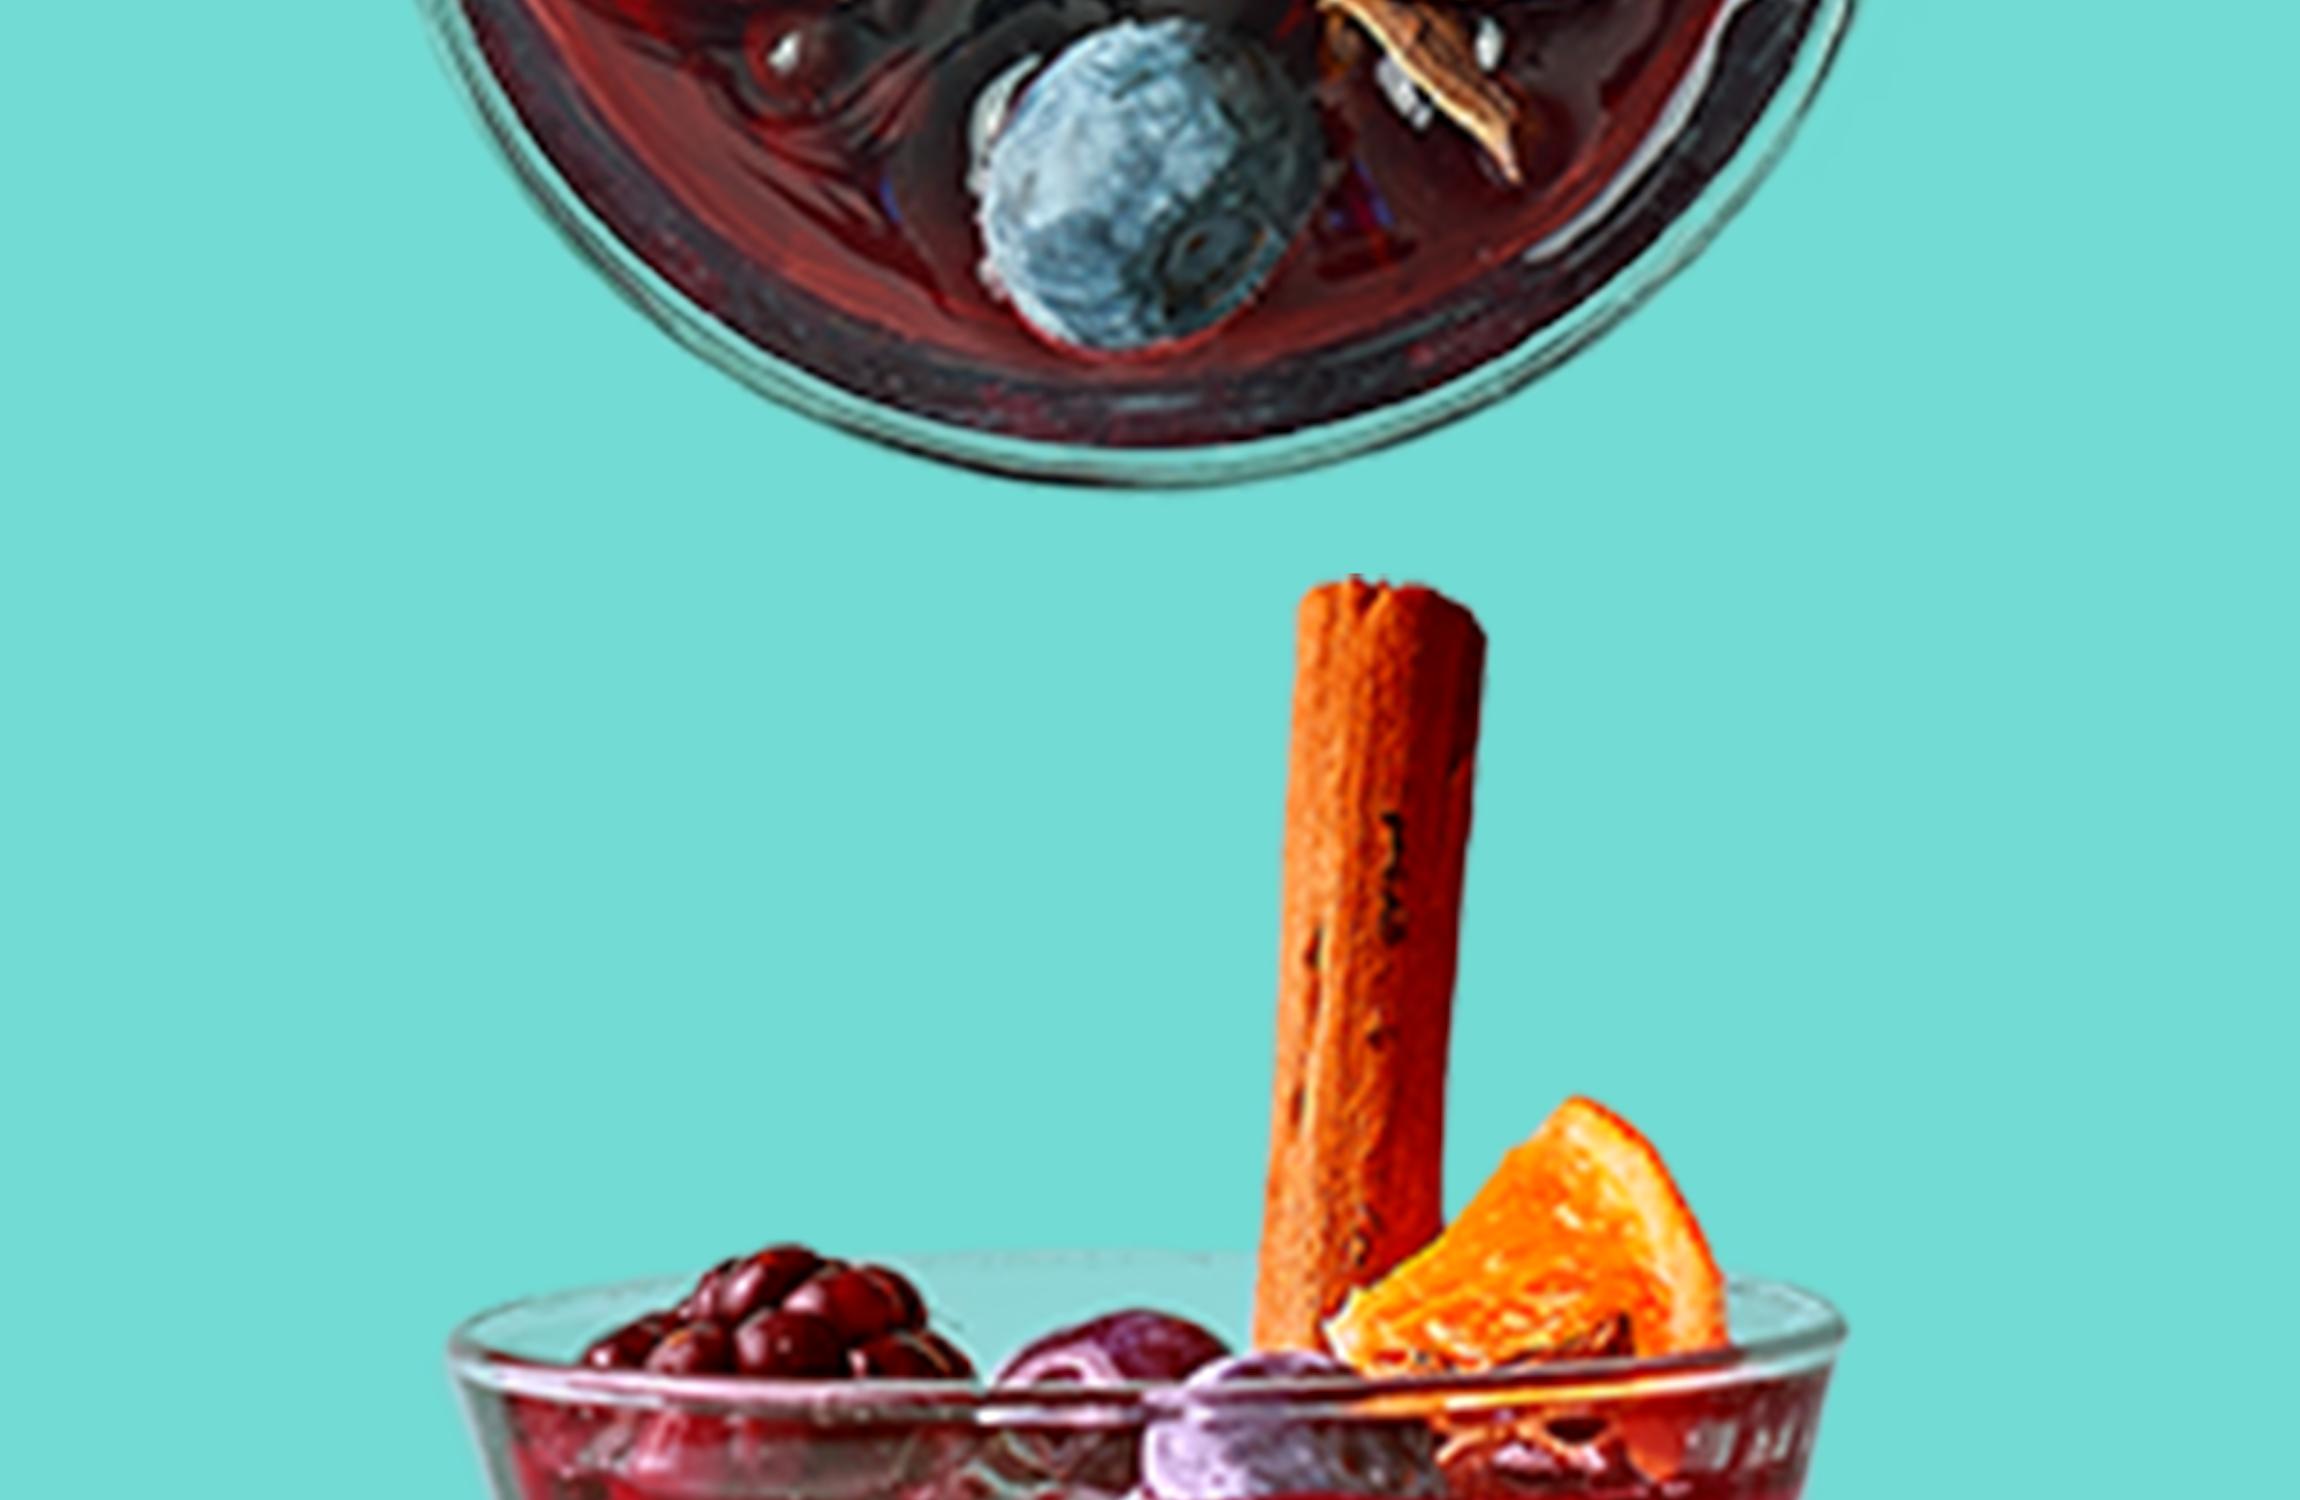 Berry Boozy & Merrily Mulled Wine